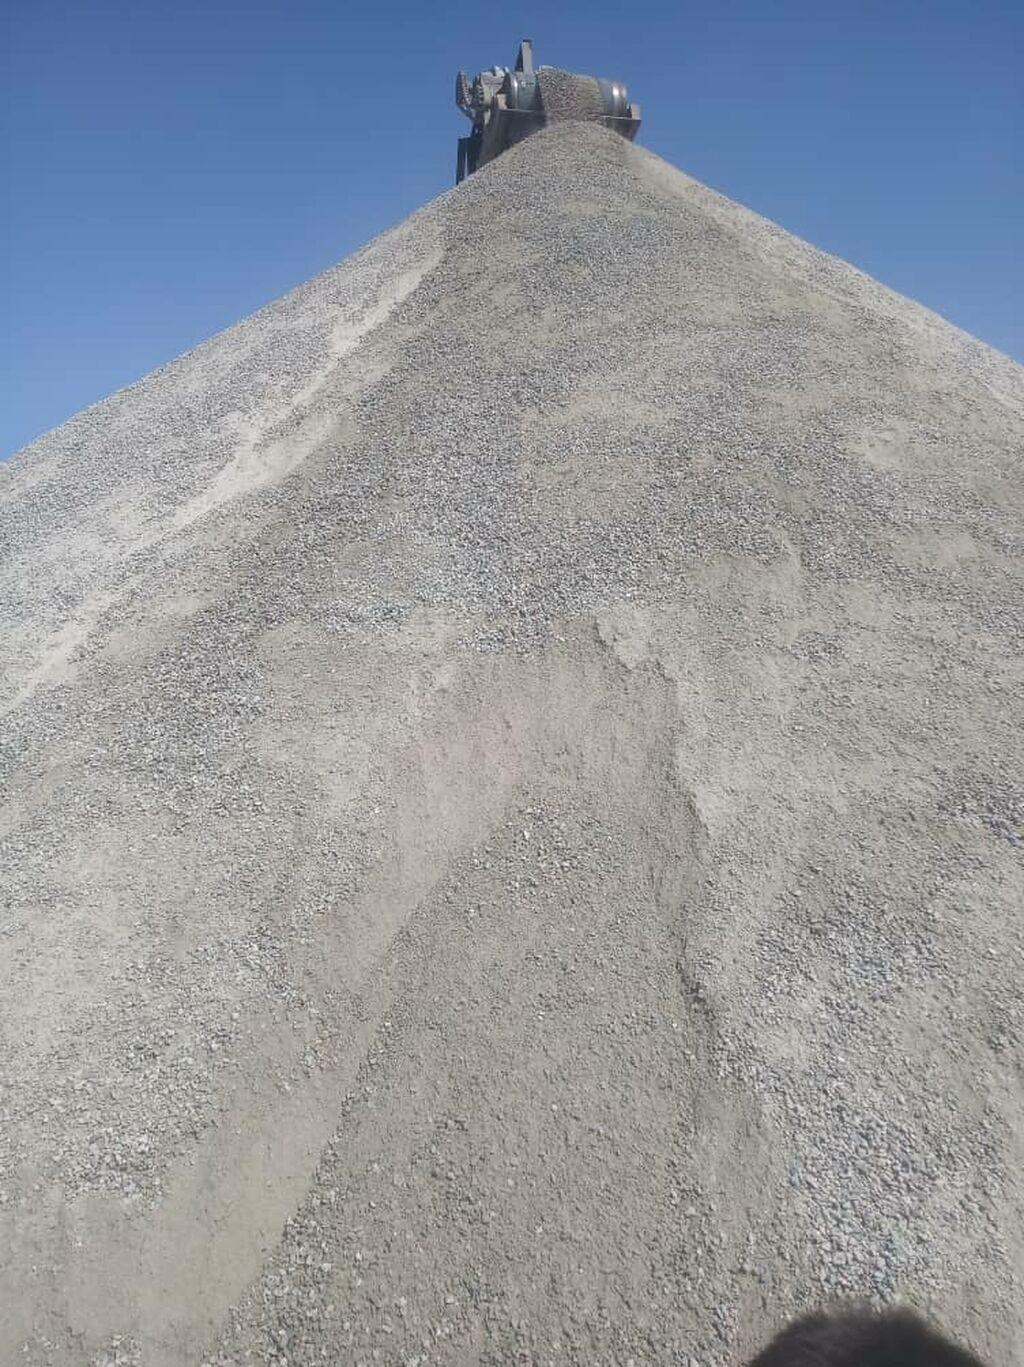 Зил По городу | Борт 8 кг. | Доставка щебня, угля, песка, чернозема, отсев: Зил По городу | Борт 8 кг. | Доставка щебня, угля, песка, чернозема, отсев